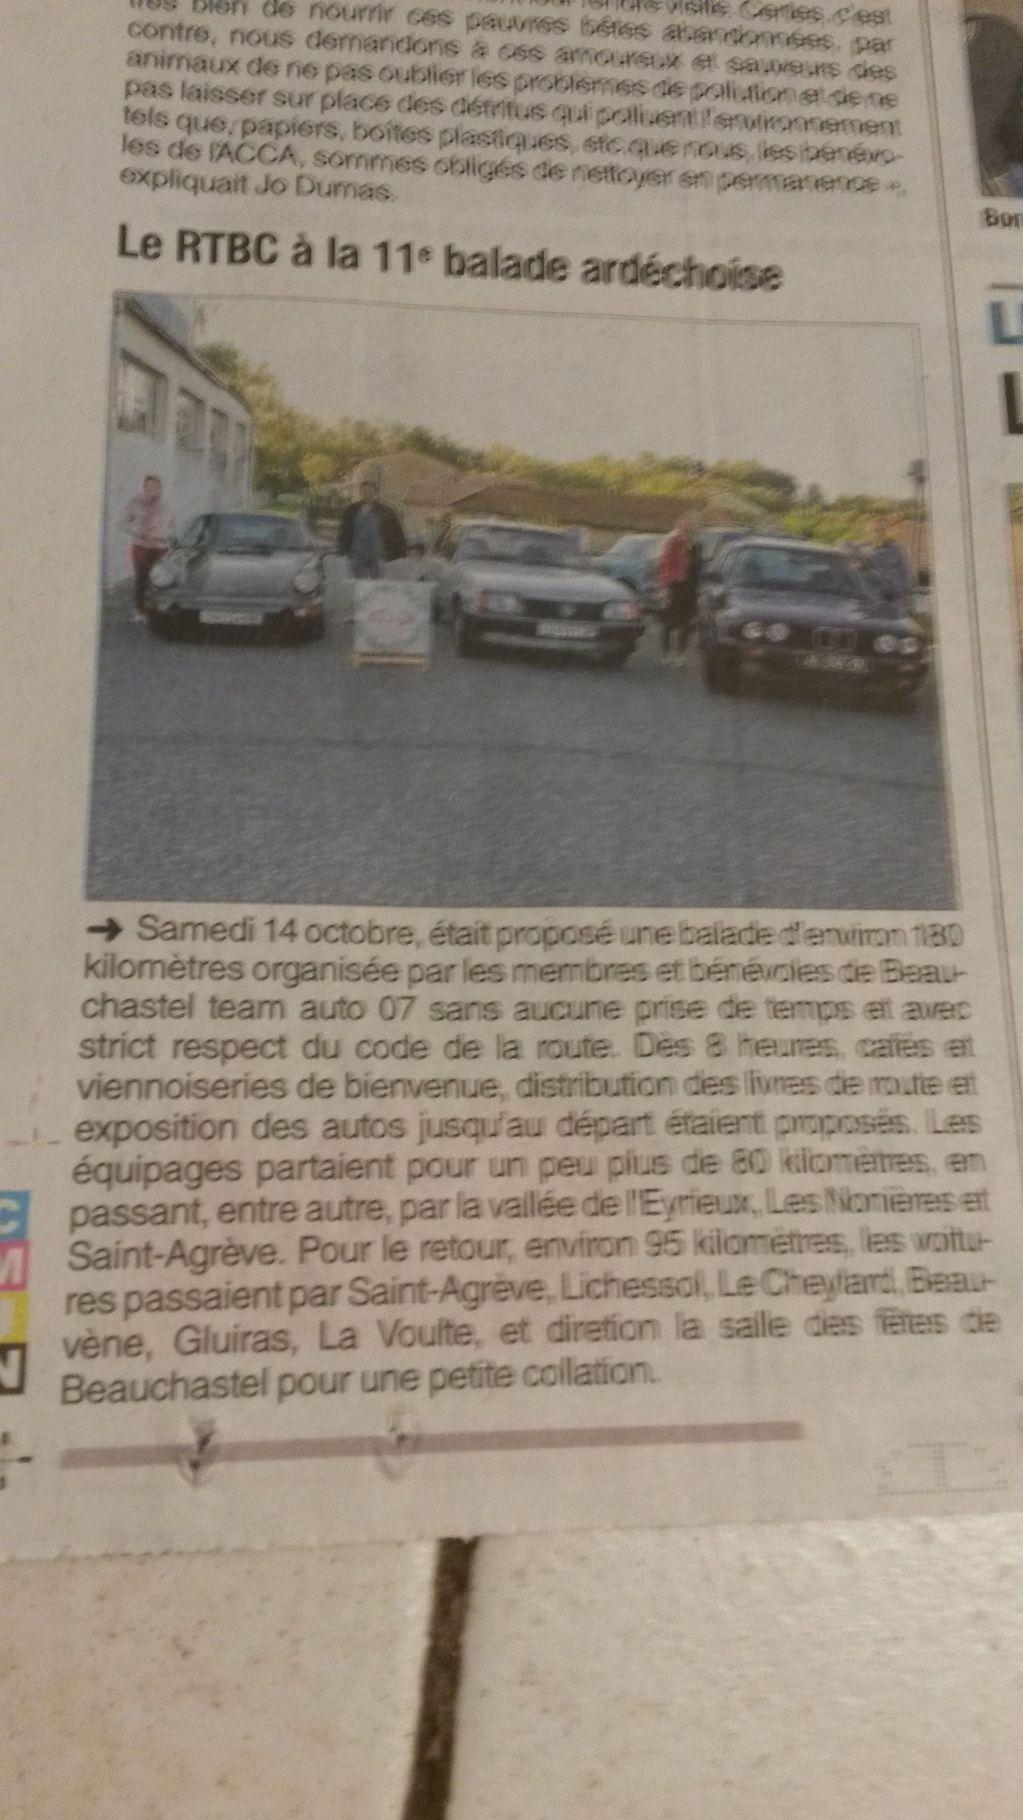 [07] 13/10/2018 - 11ème balade Ardèchoise - Beauchastel - Page 2 18101508372823632315943338